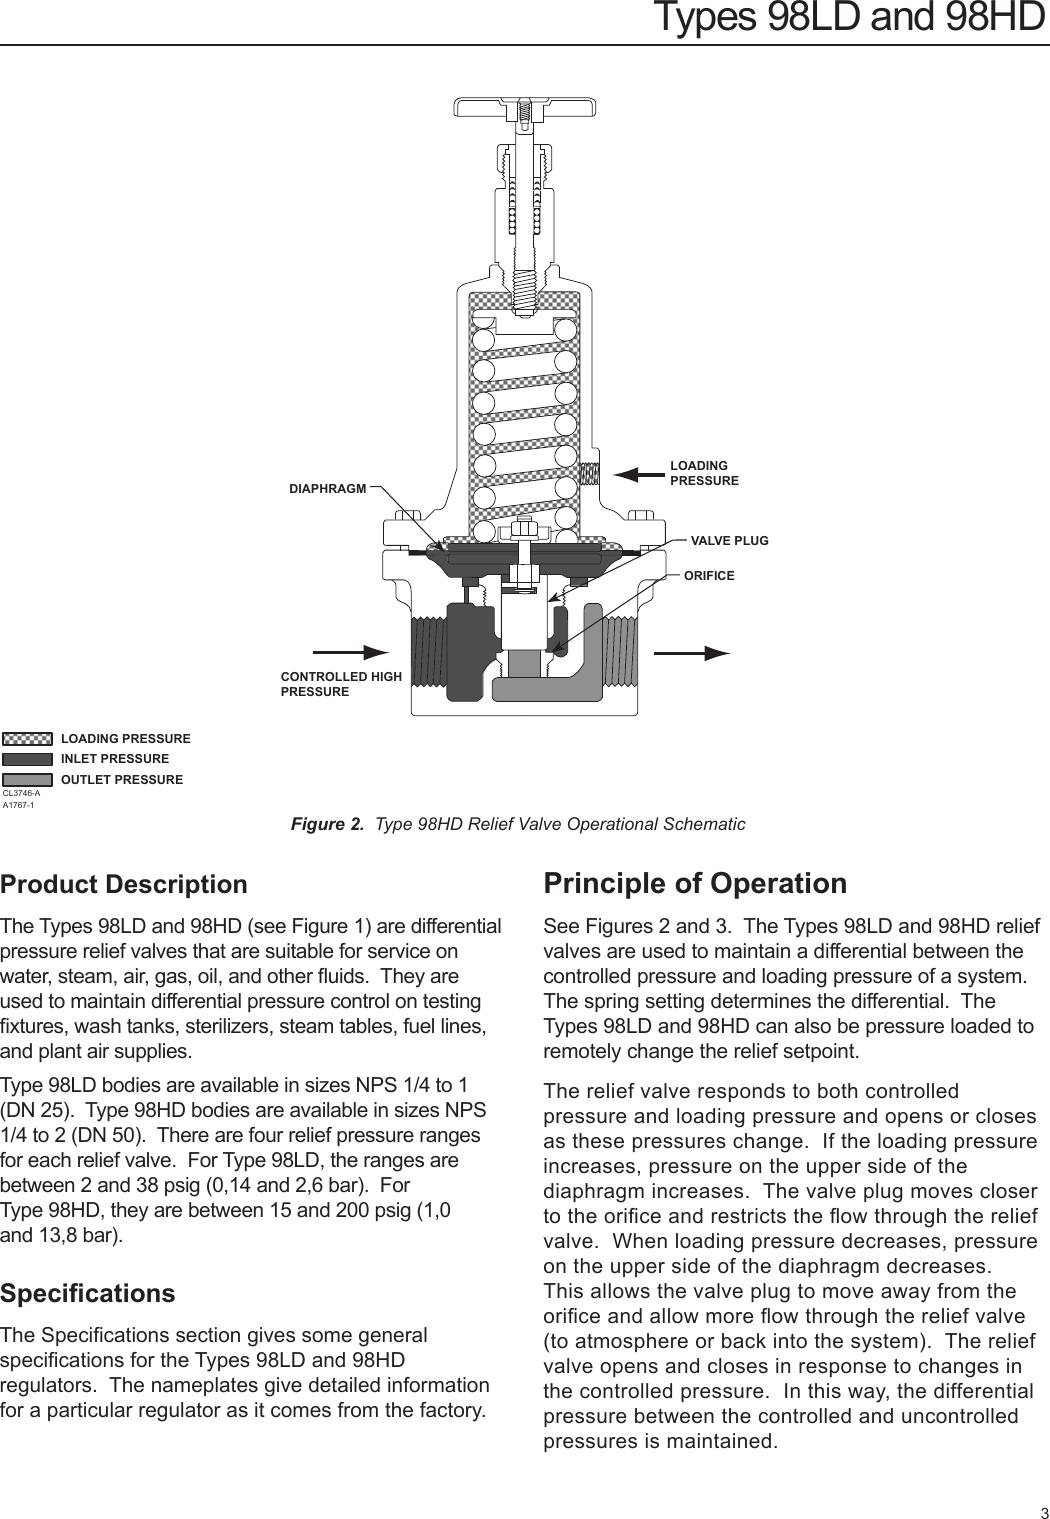 Ipr Valve Resistance Manual Guide